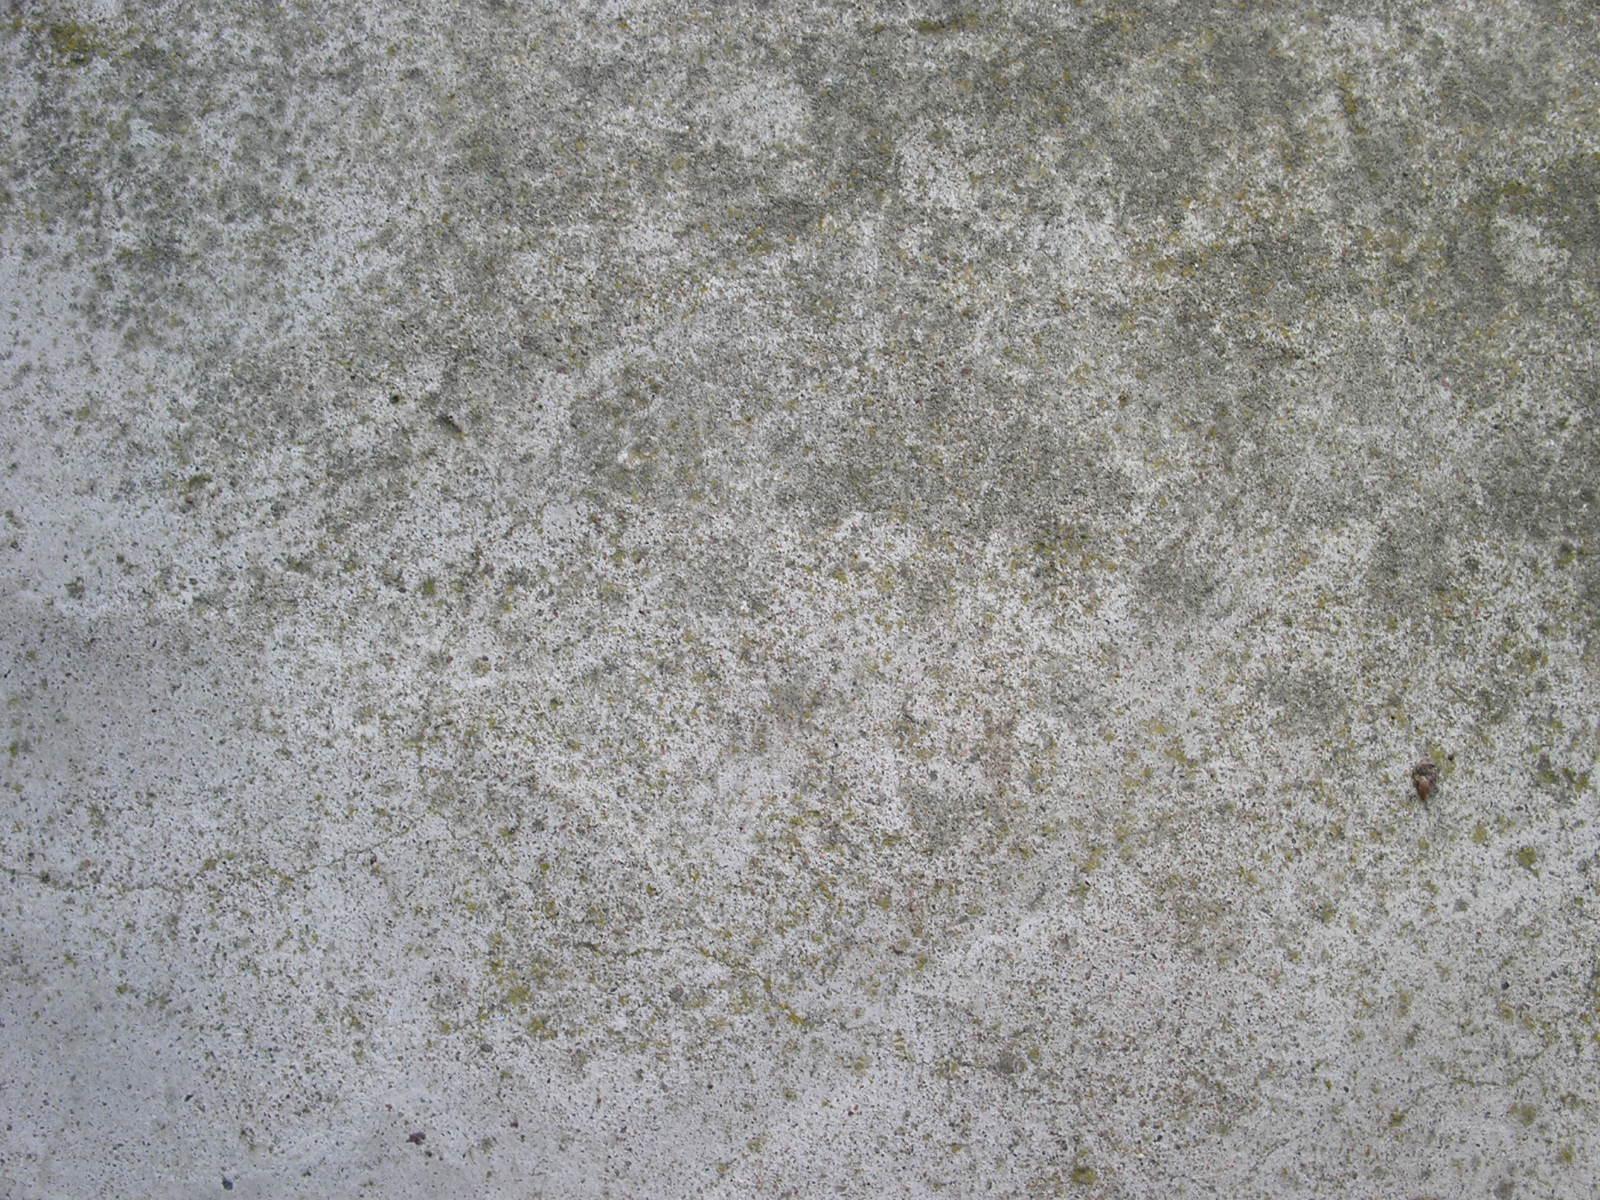 texture stone stones stone wall download photo image stone 1600x1200